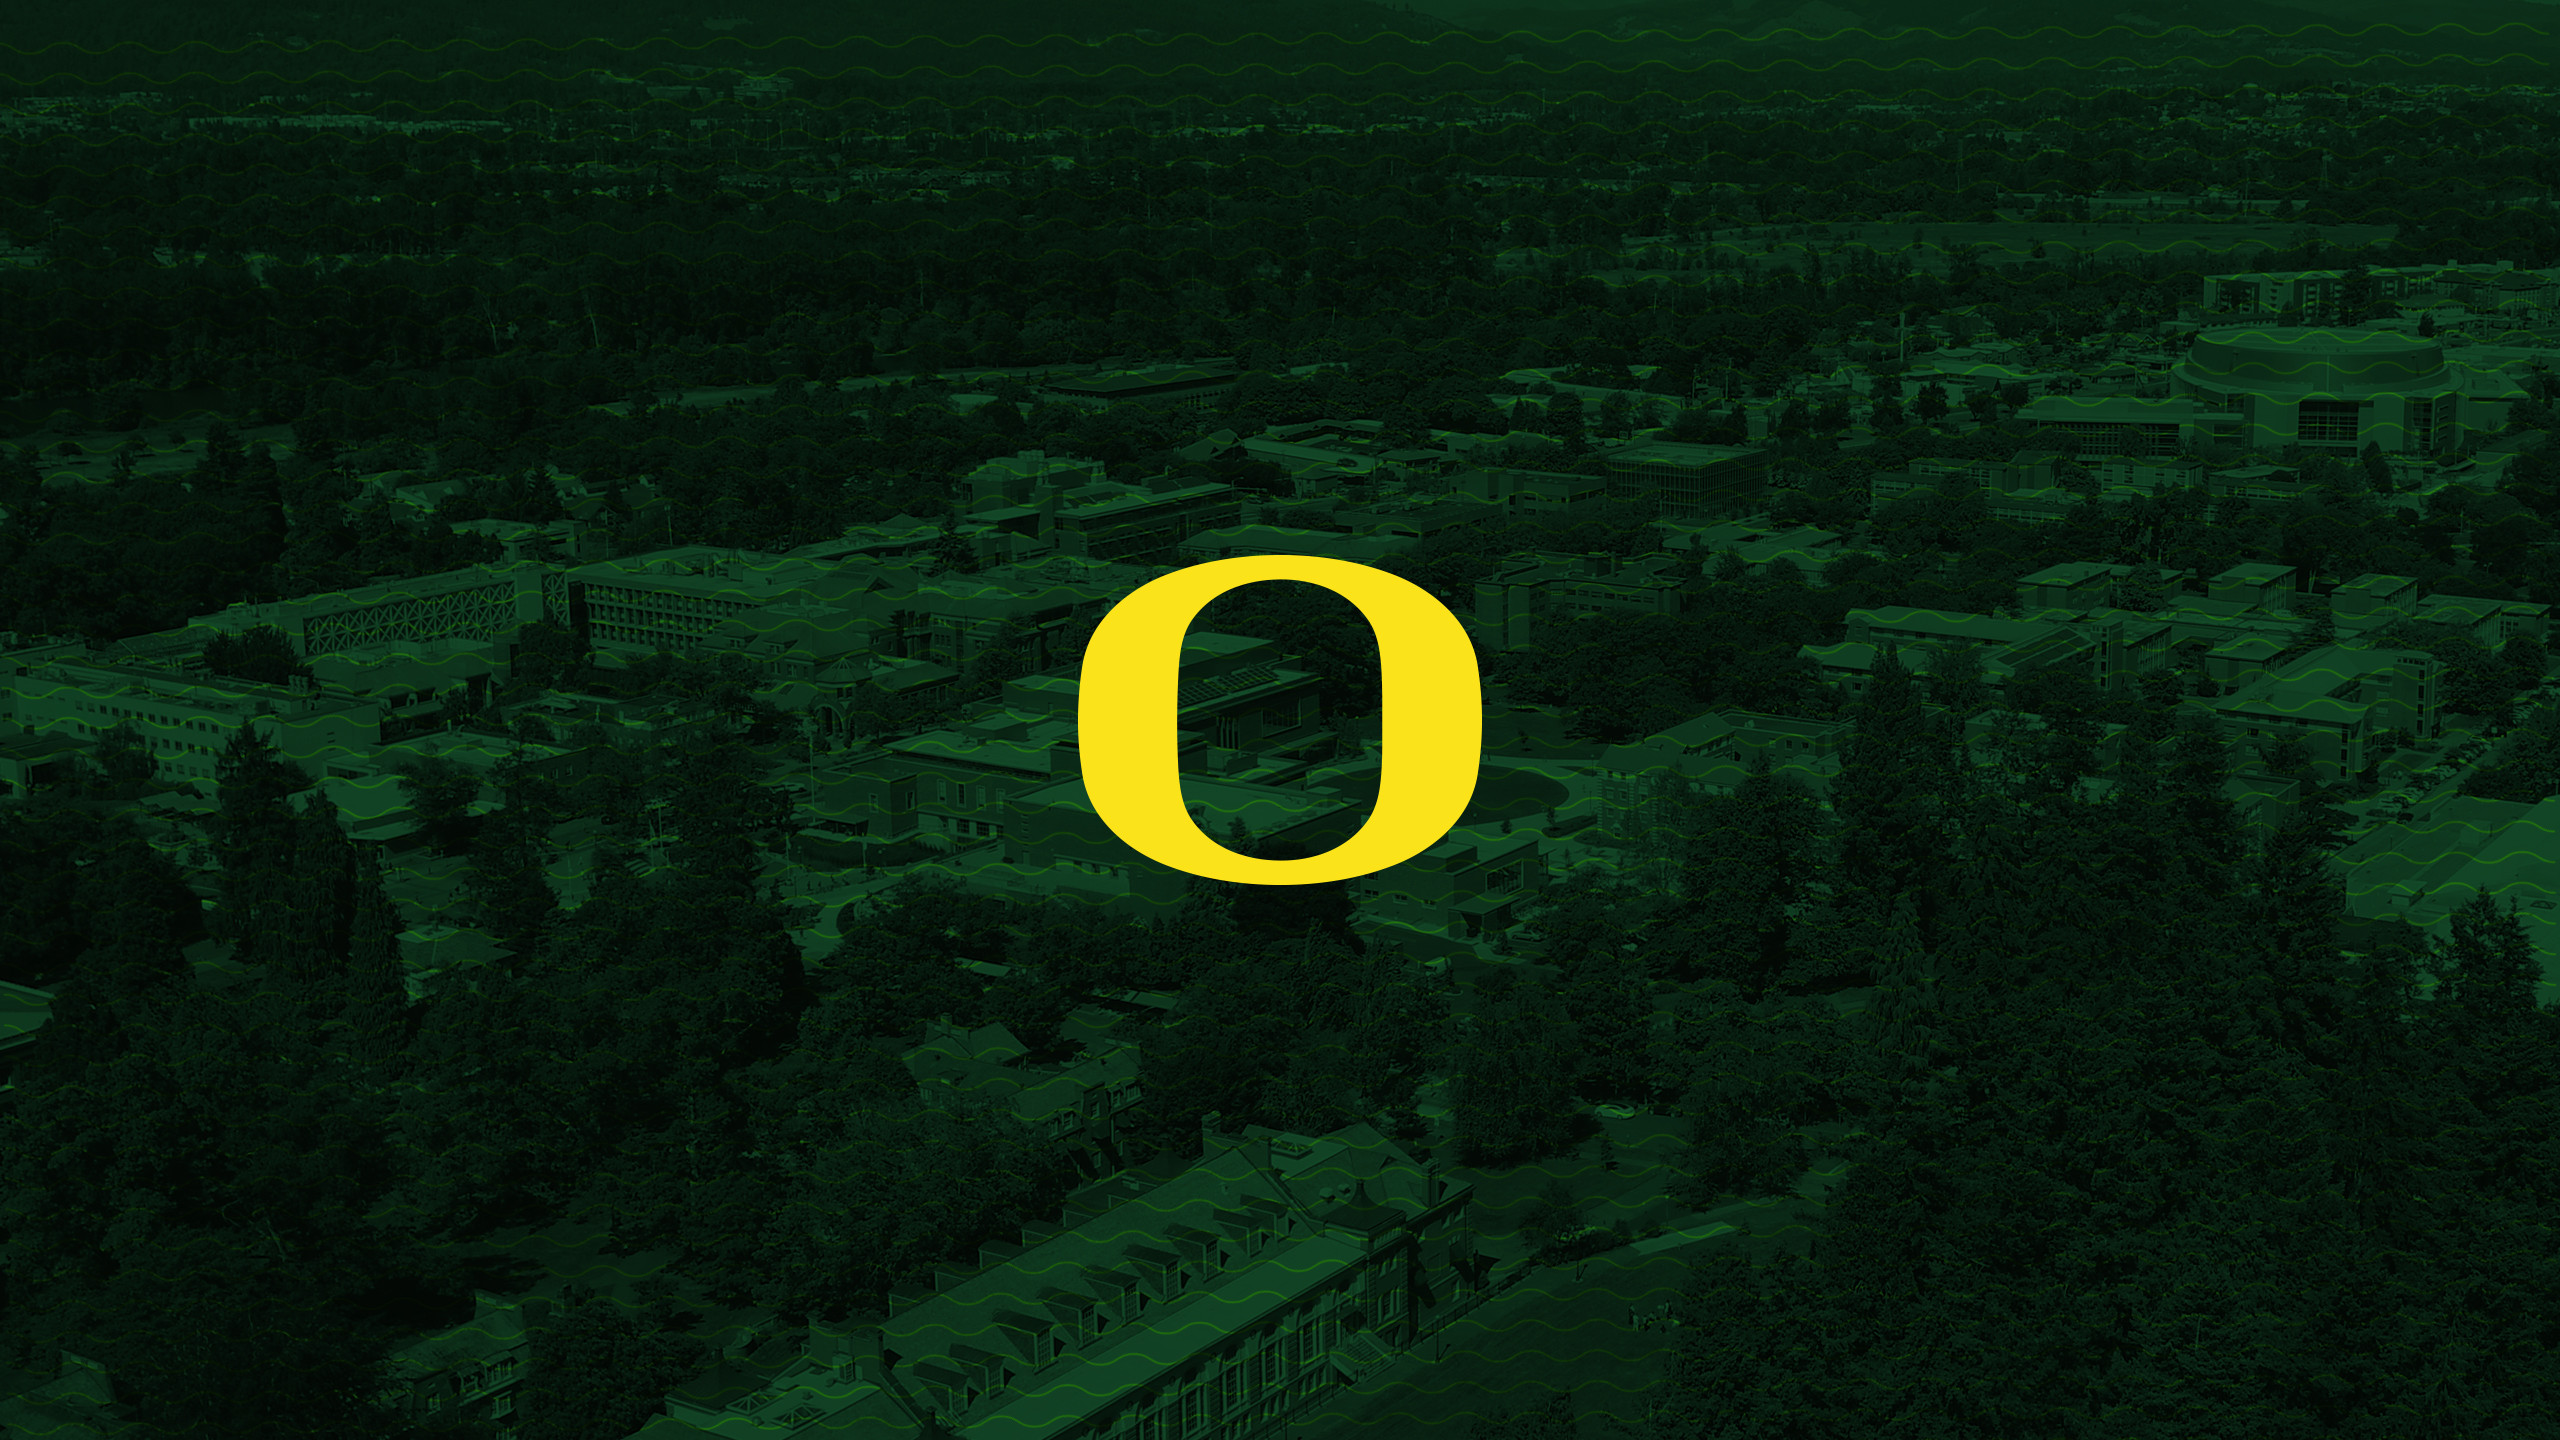 University of Oregon LinkedIn 2560x1440